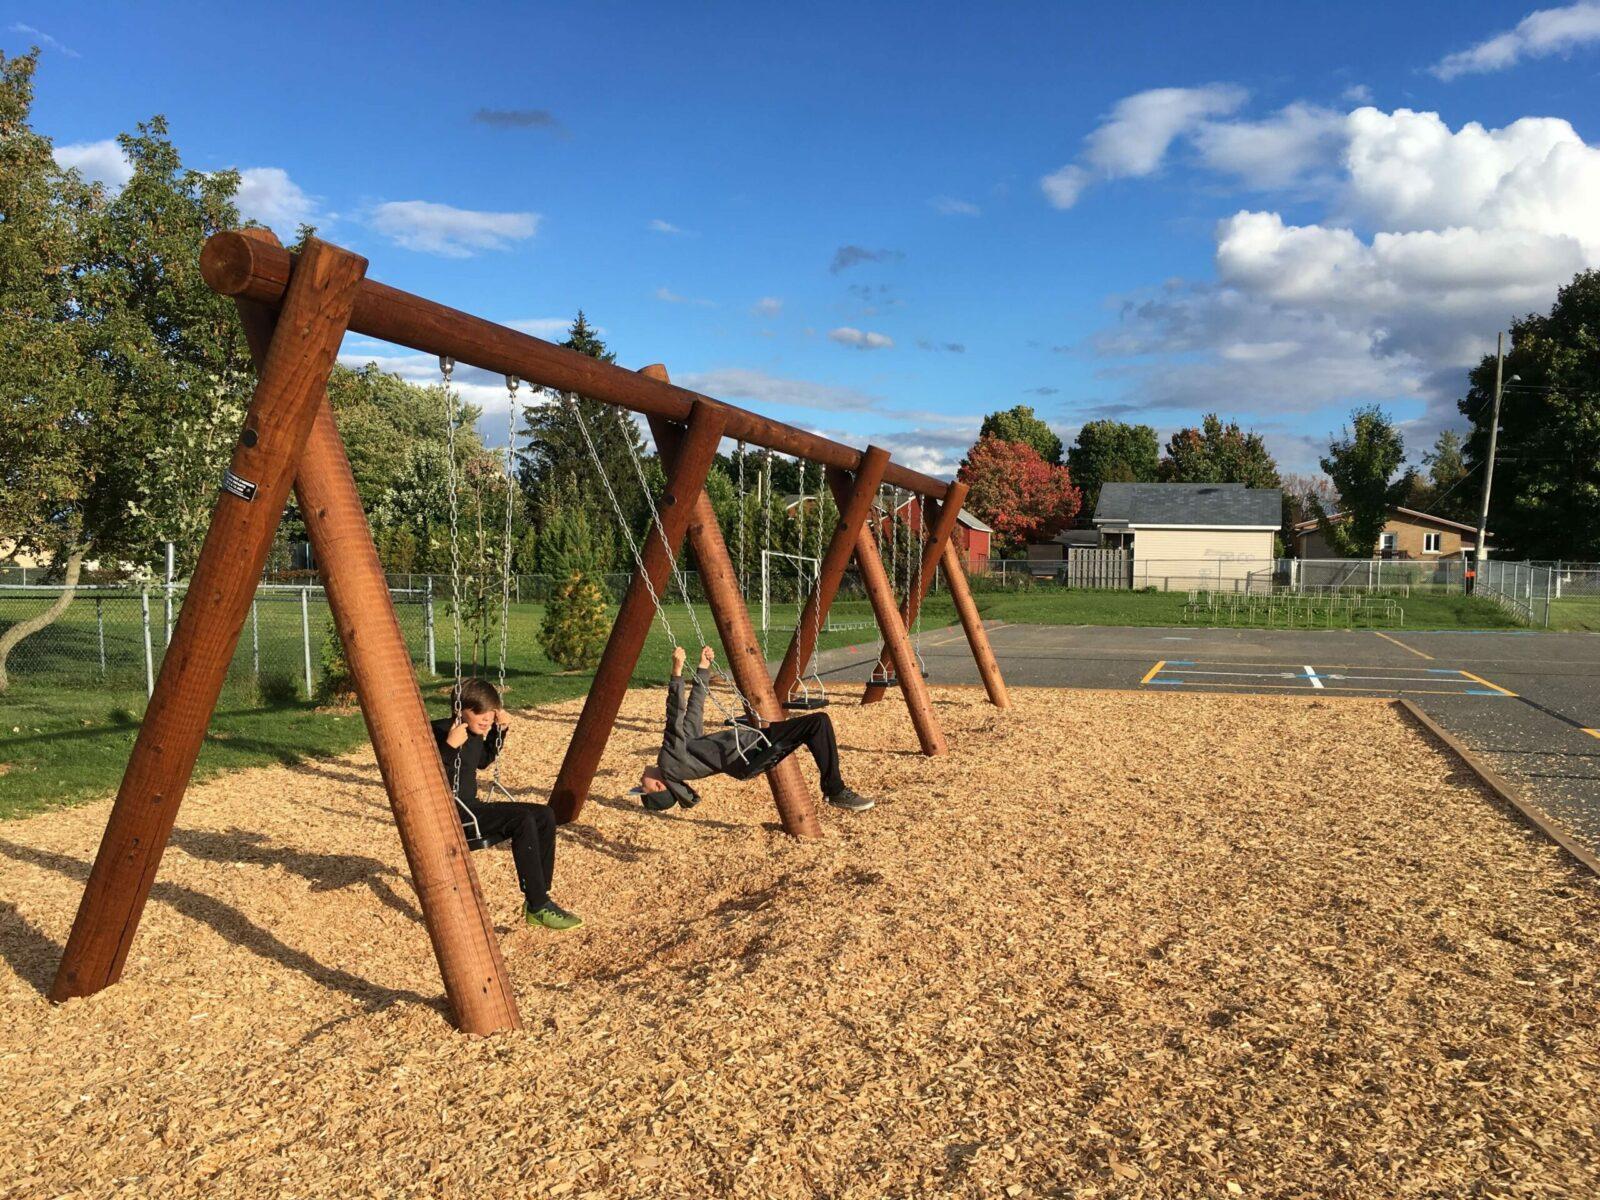 Log swing with children